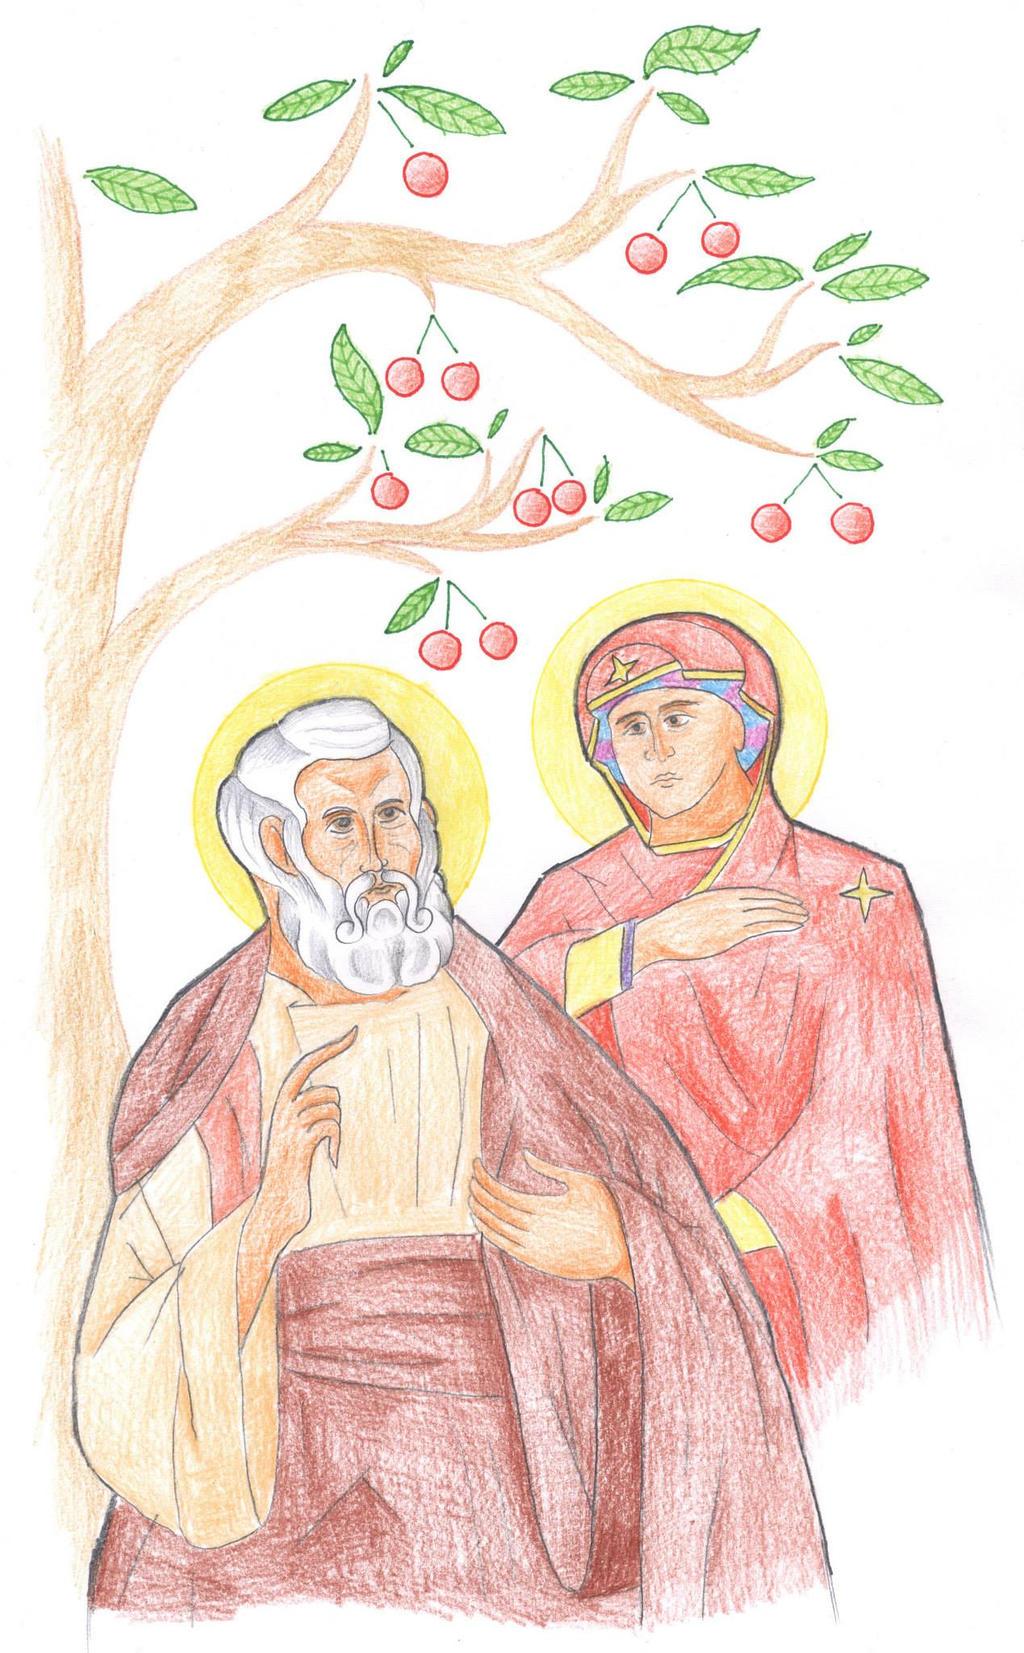 Matthew 1:18-19 by Parastos